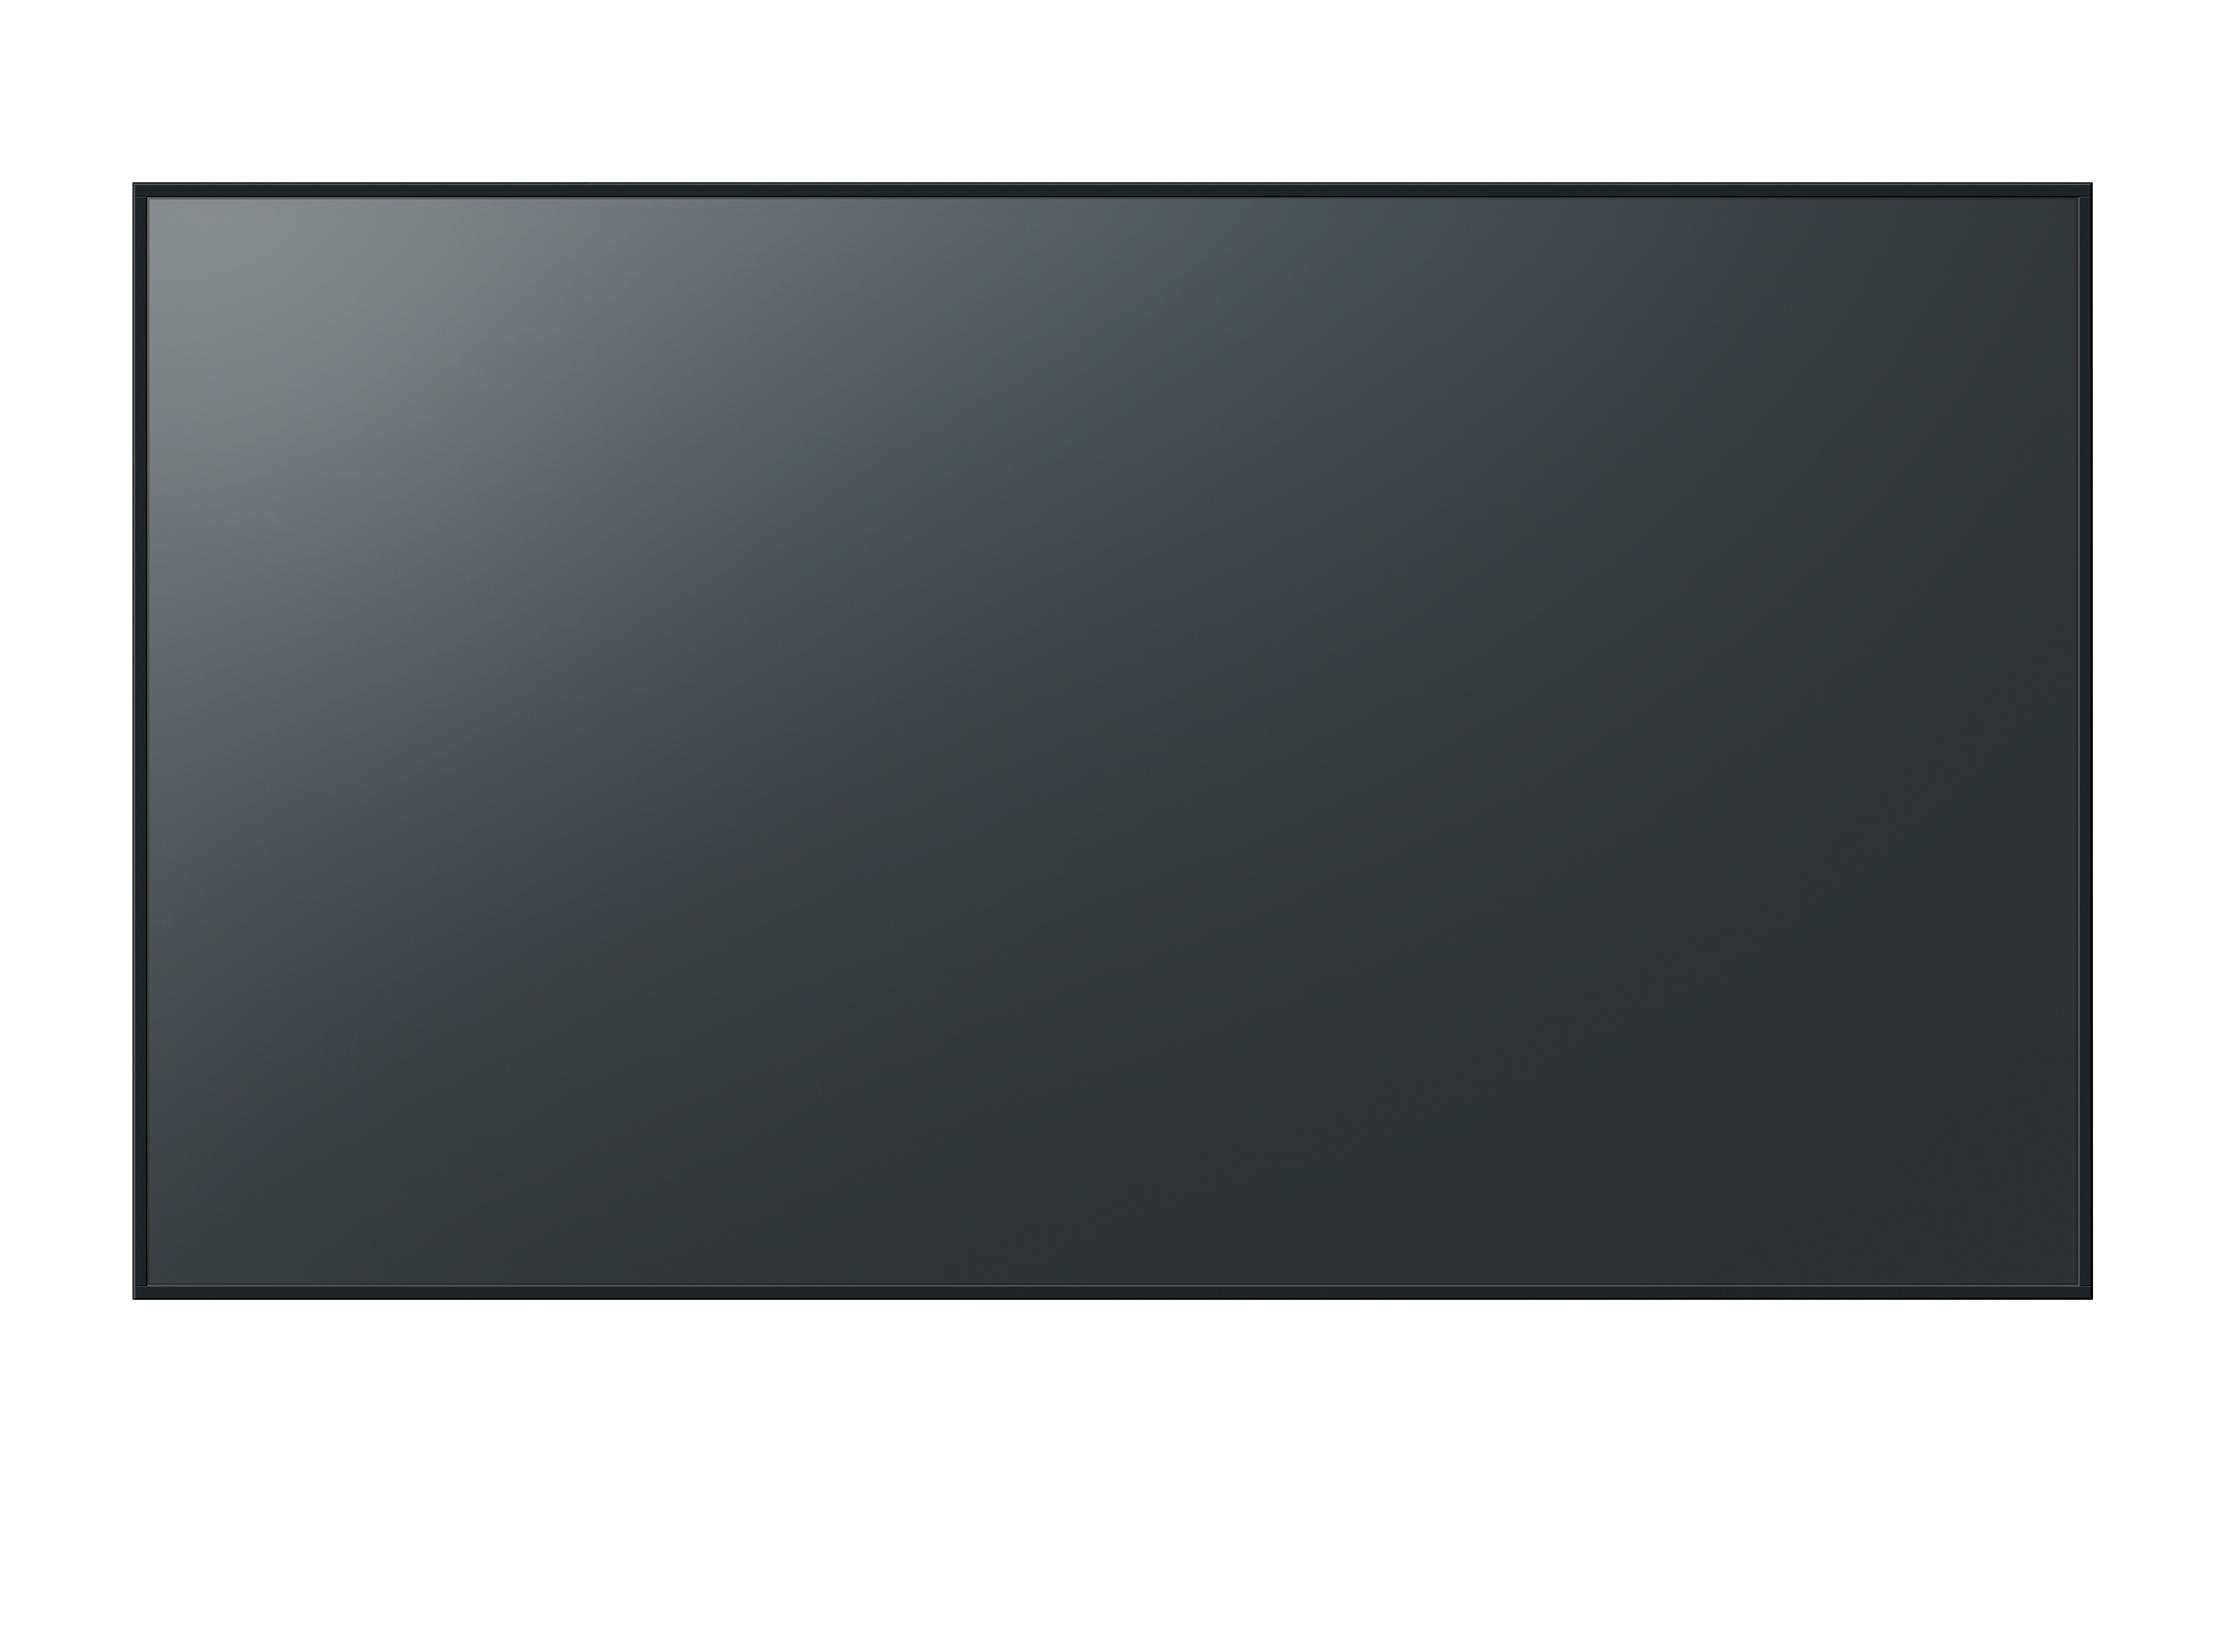 PANASONIC PANASONIC TH-55EQ1 - Ecran professionnel résolution UHD 4K 350 cd - 55``